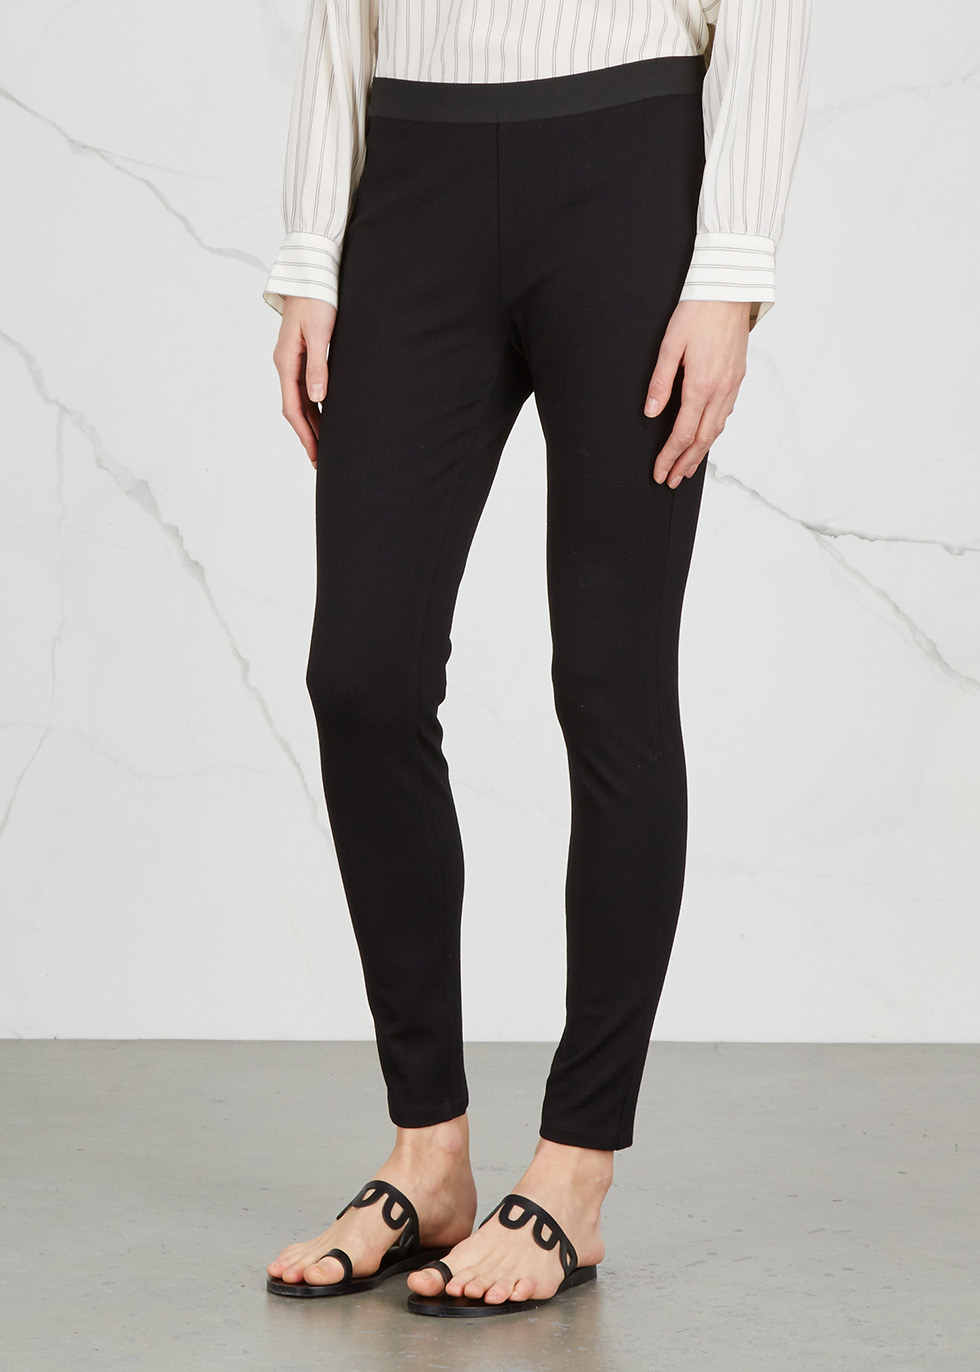 Black skinny ponte jersey leggings - EILEEN FISHER